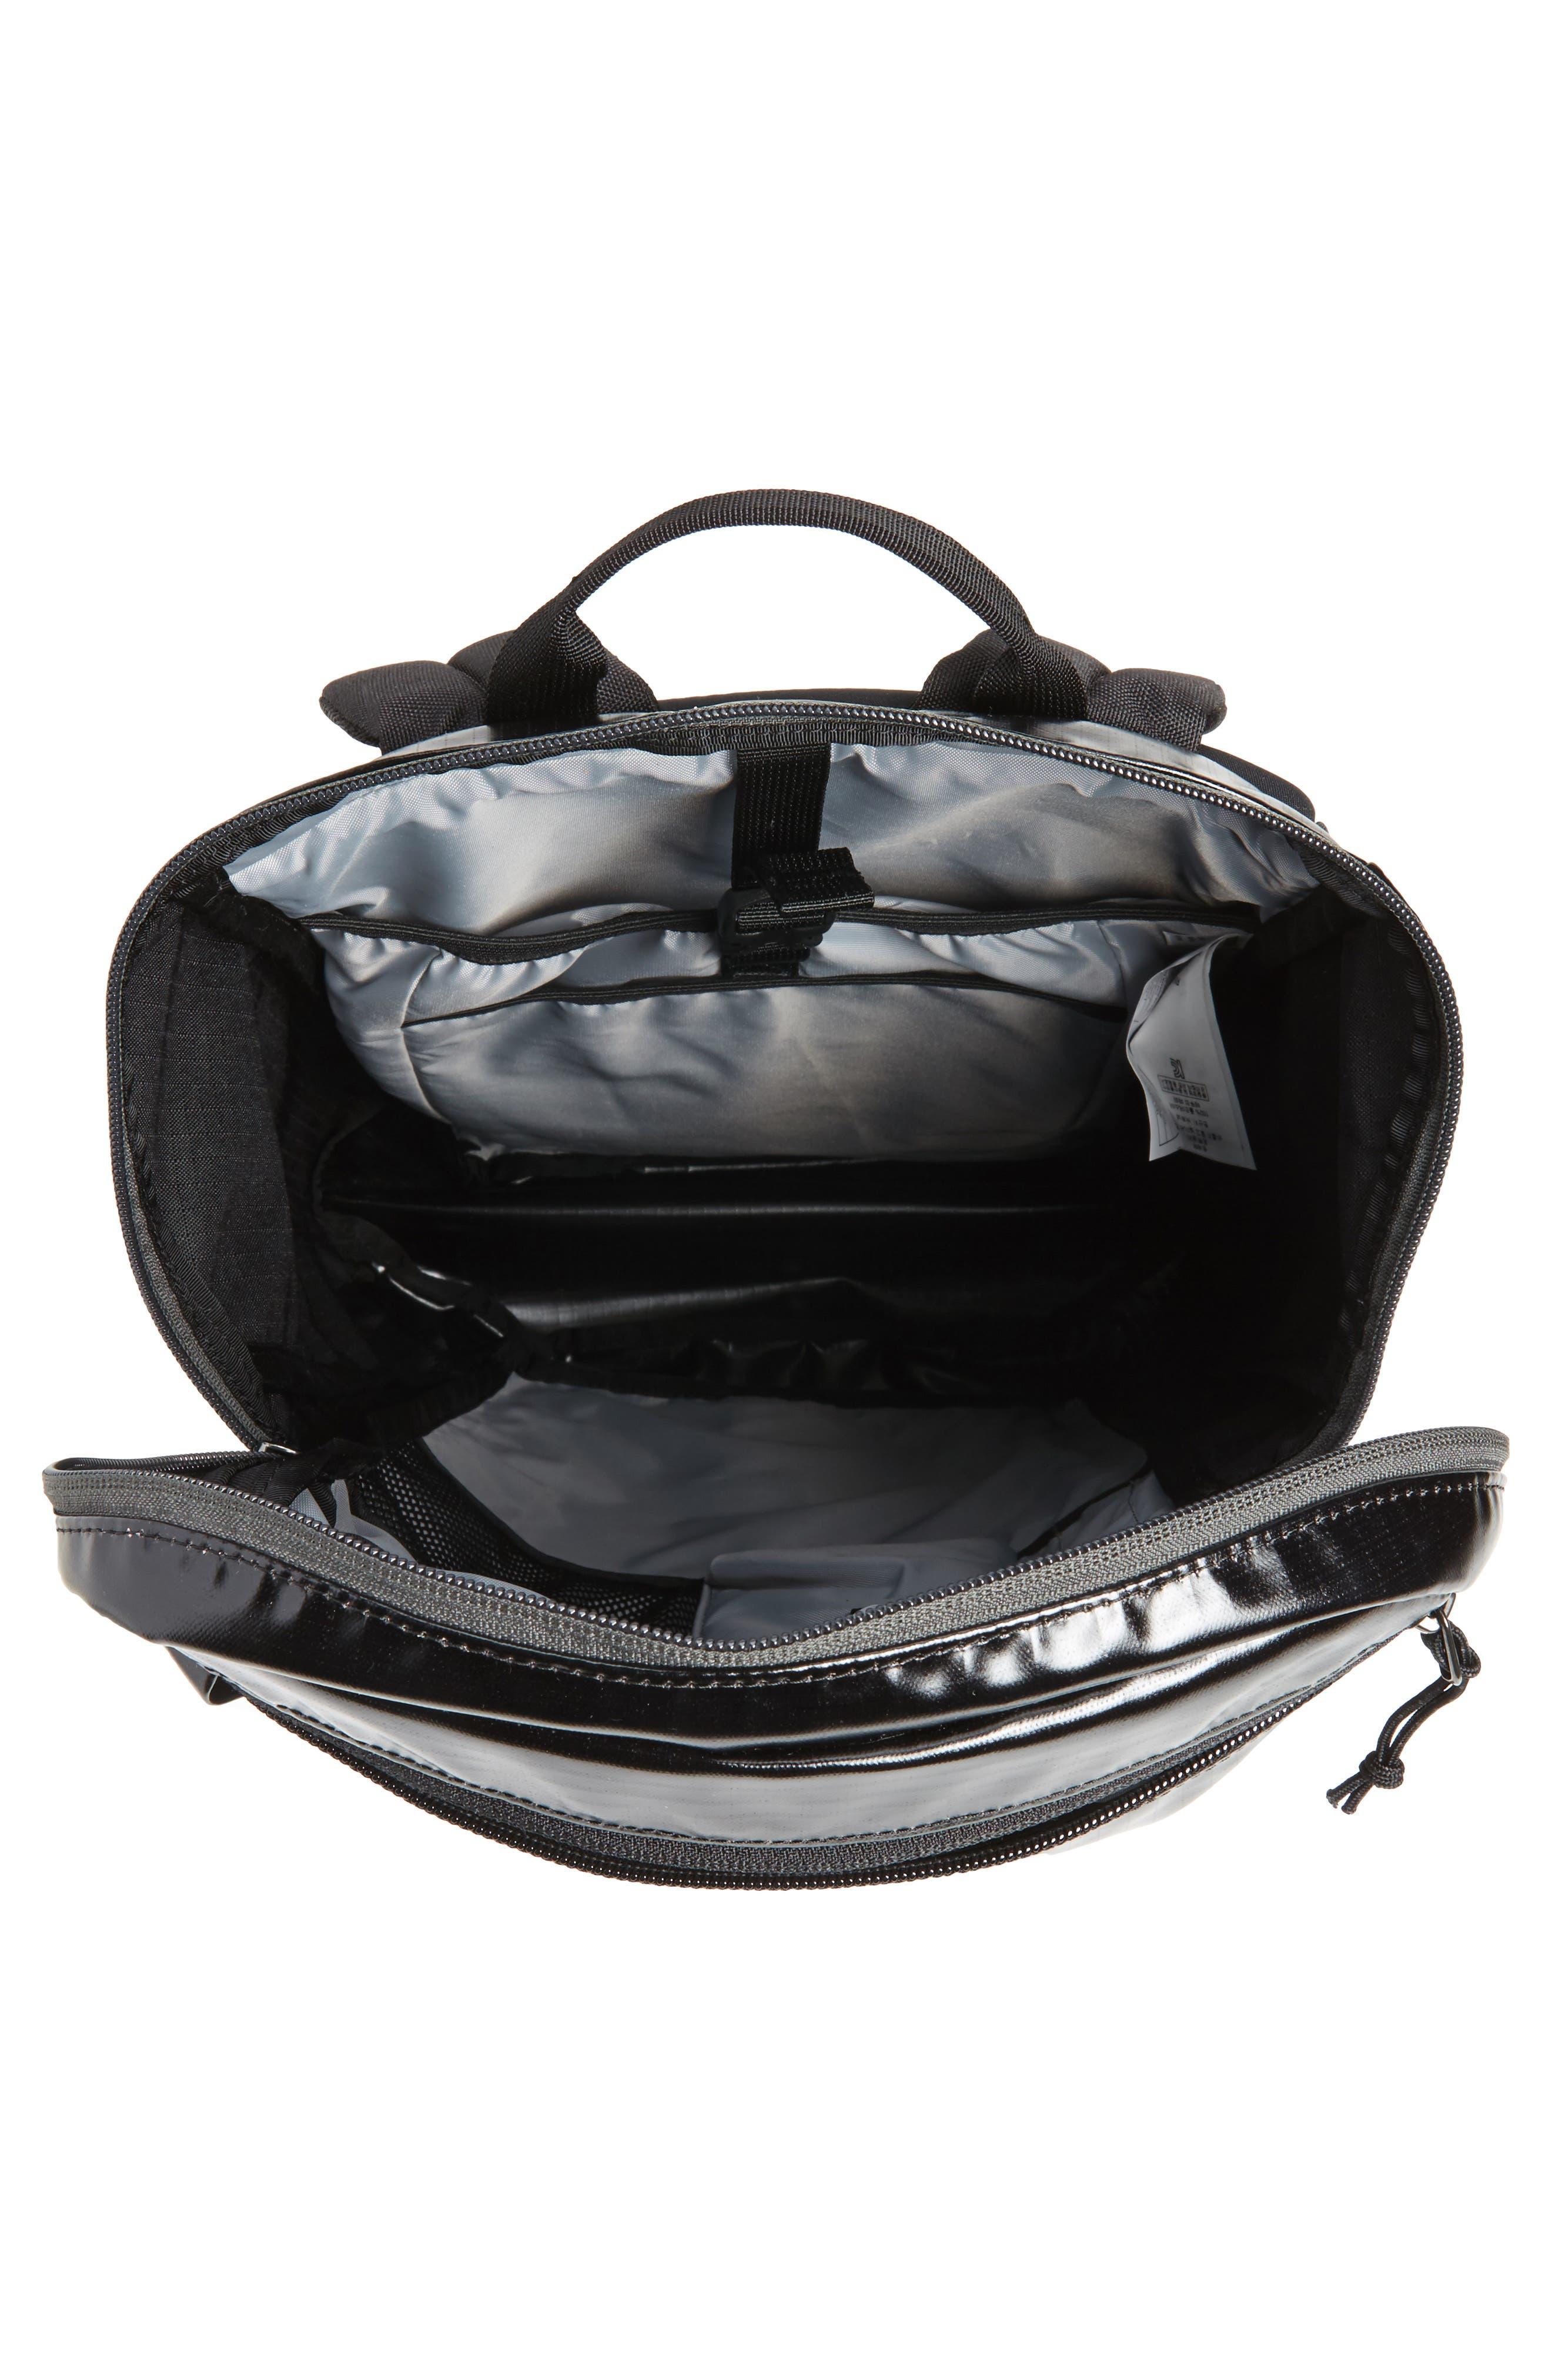 Black Hole 25 Liter Backpack,                             Alternate thumbnail 4, color,                             Black